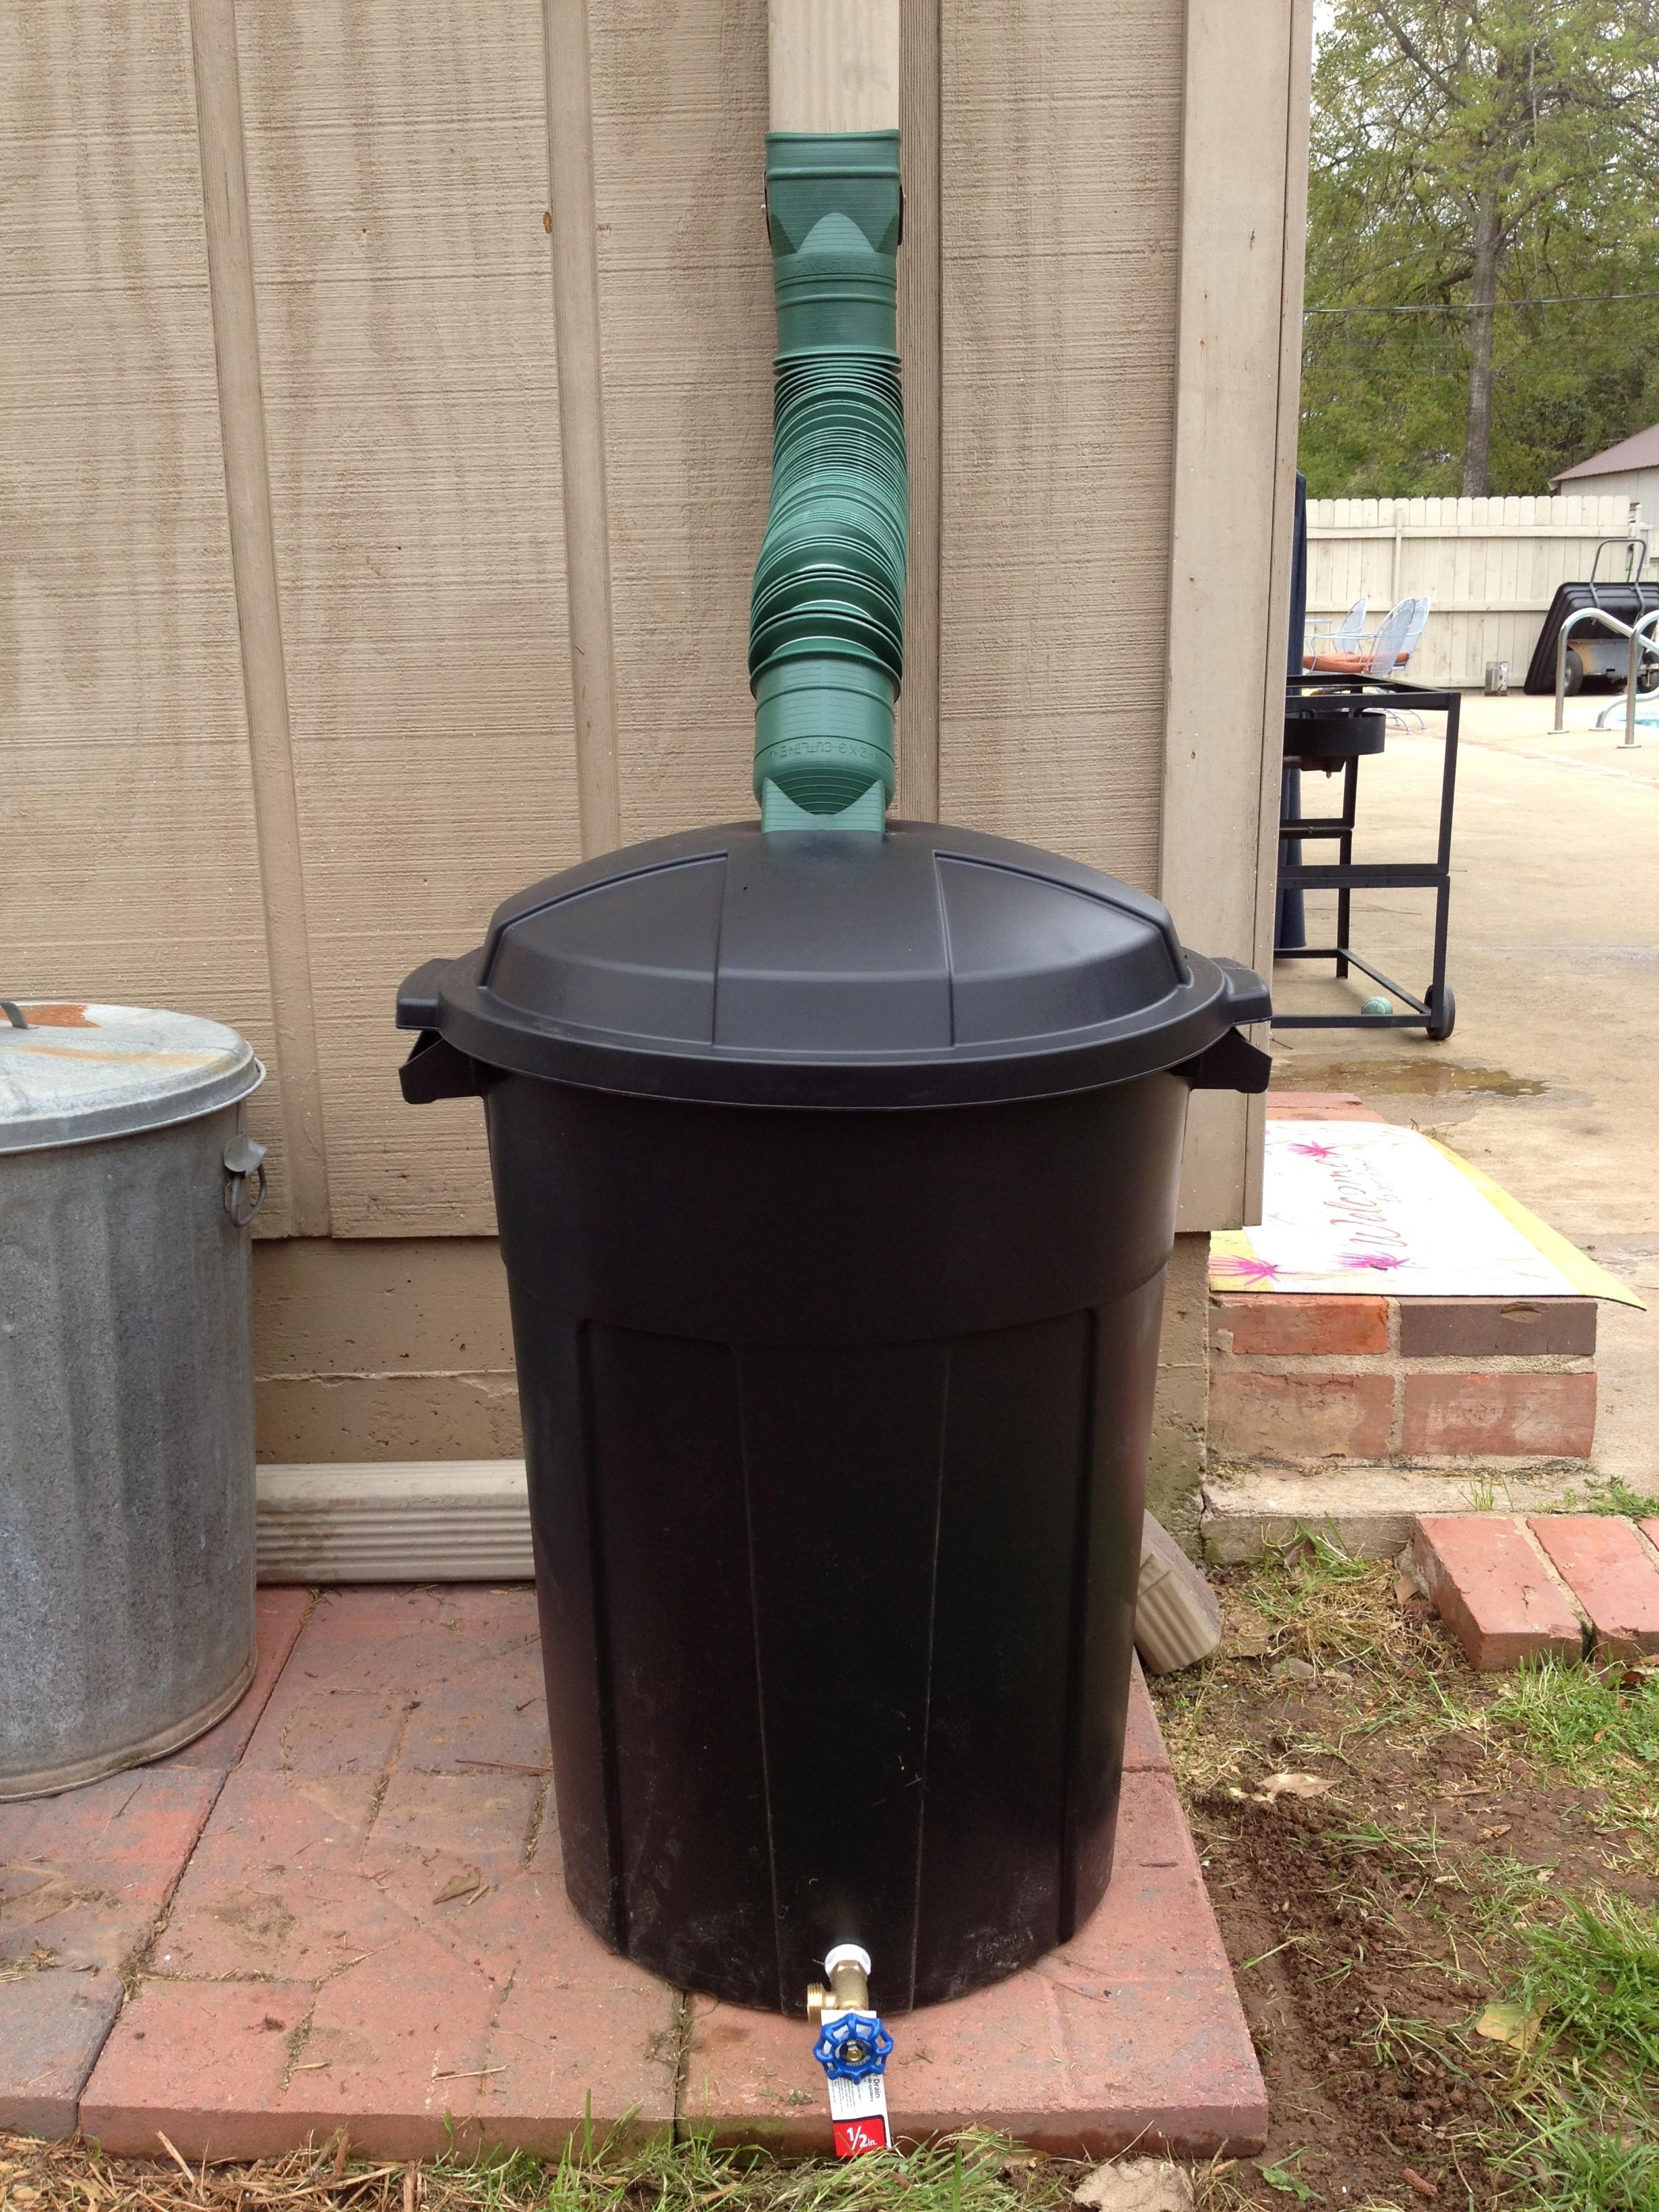 Best ideas about Rain Barrel DIY . Save or Pin diy rain barrel Now.